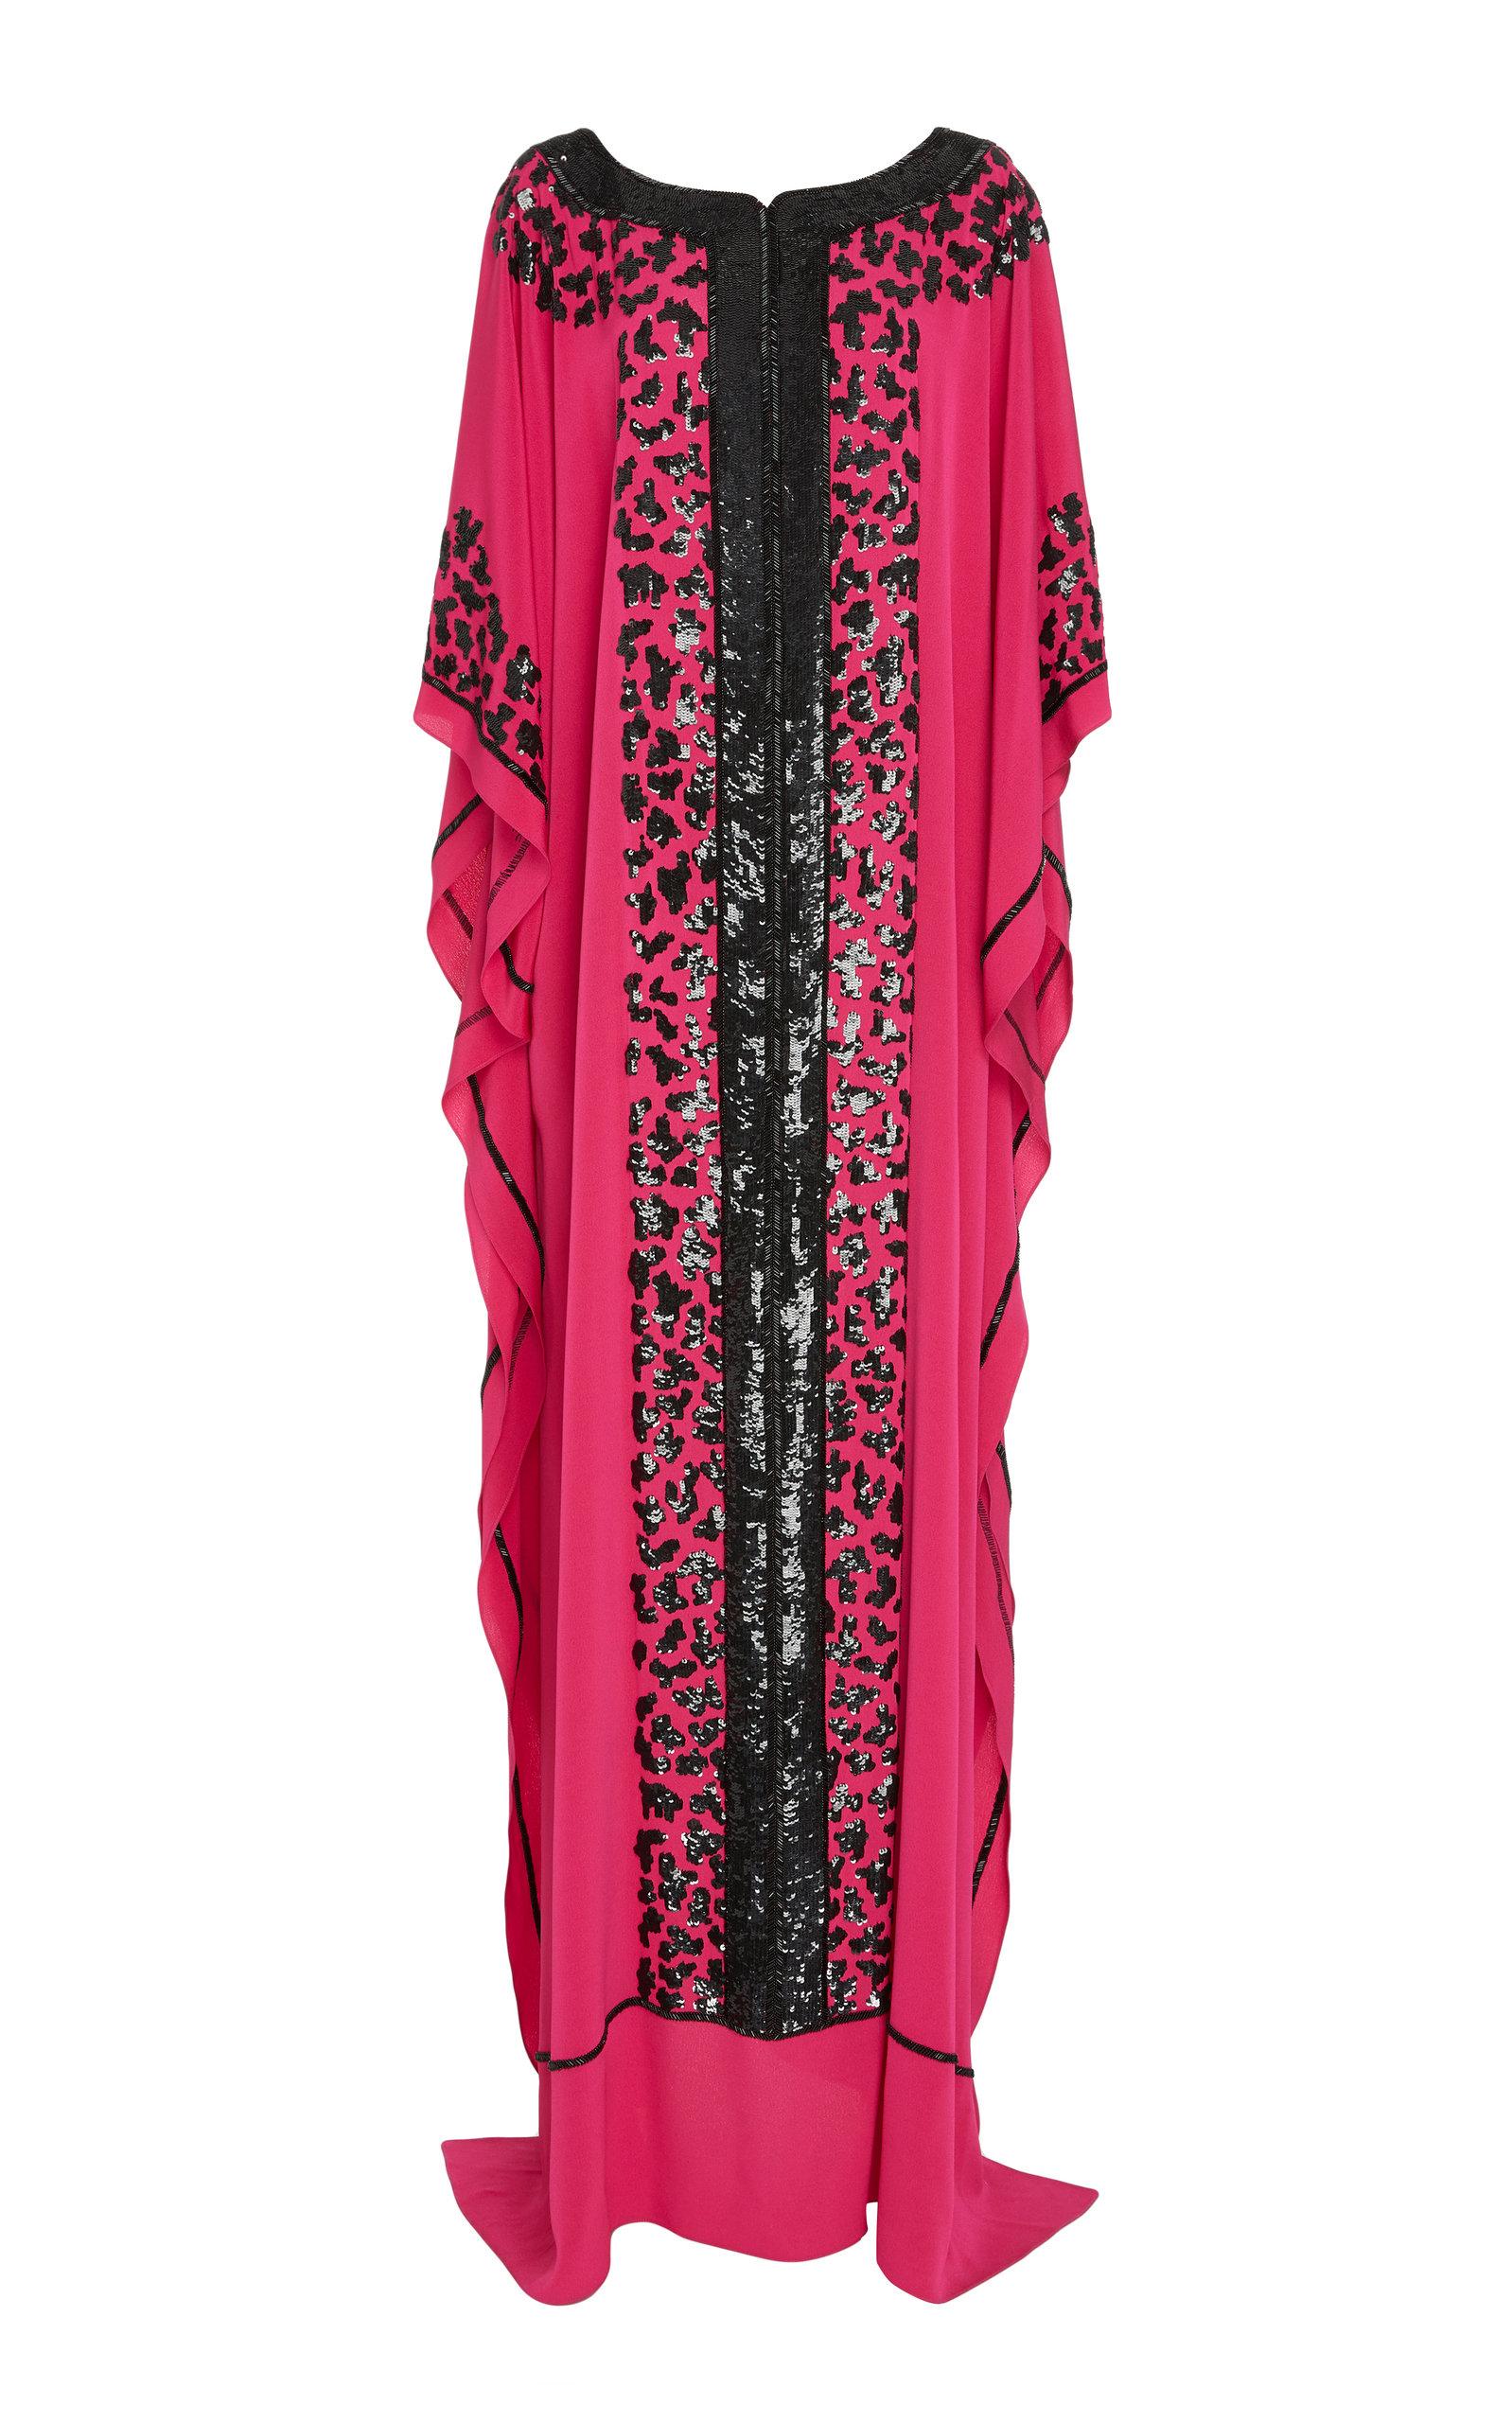 JOANNA MASTROIANNI Leopard-Print Embellished Silk Caftan in Pink